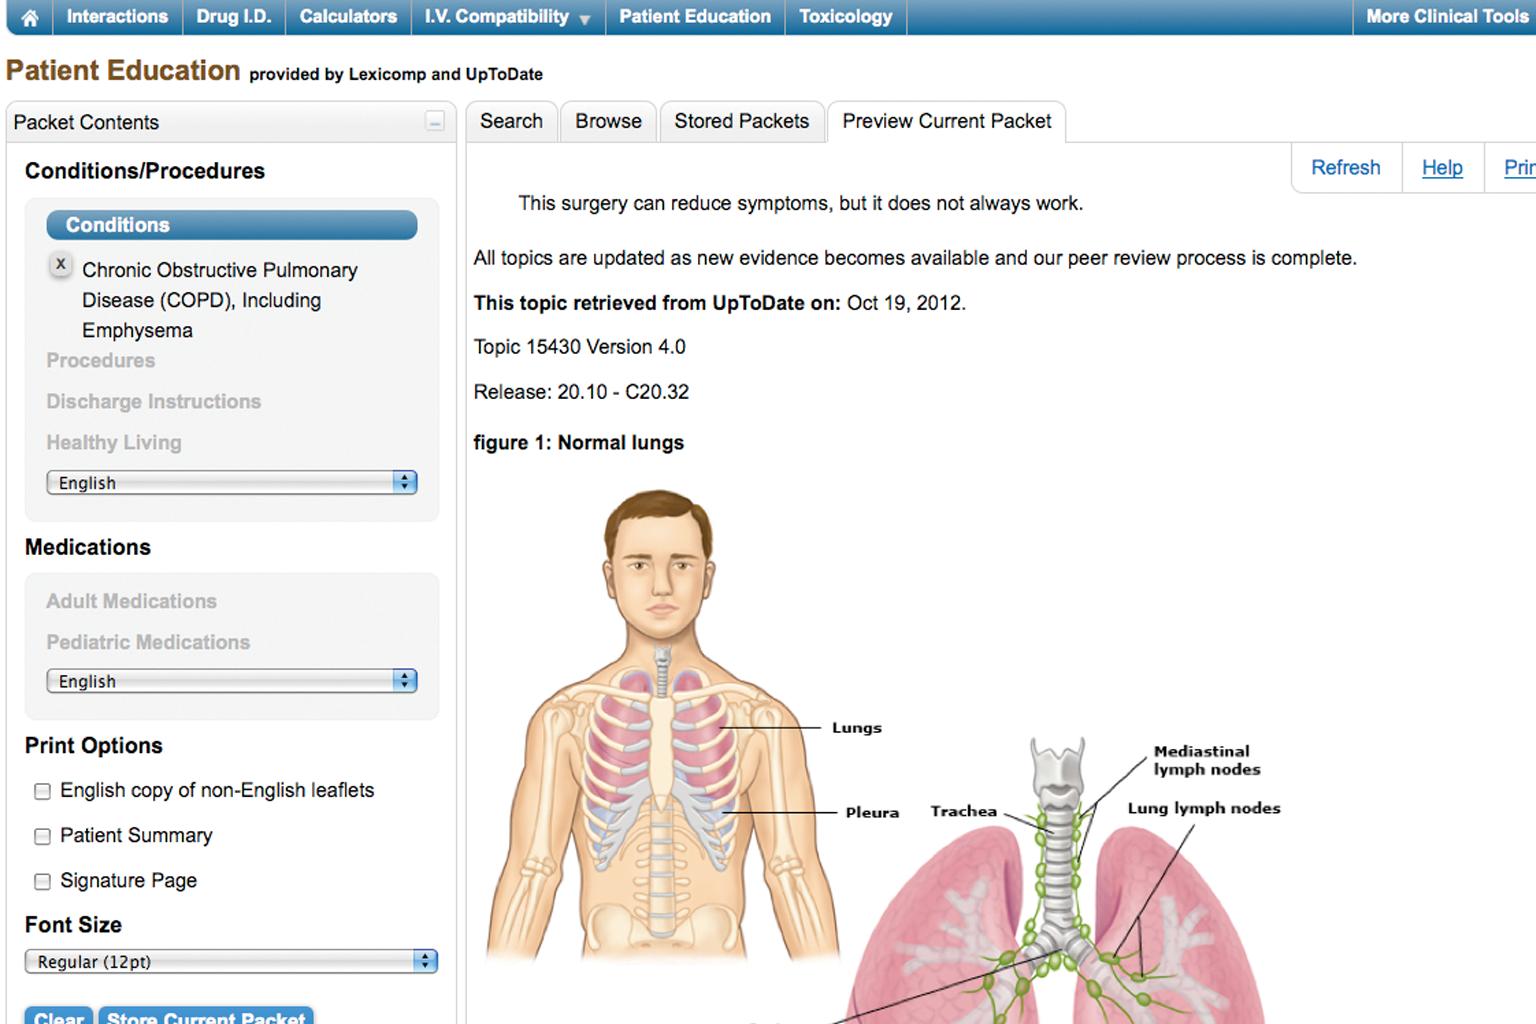 screenshot of Lexicomp patient education